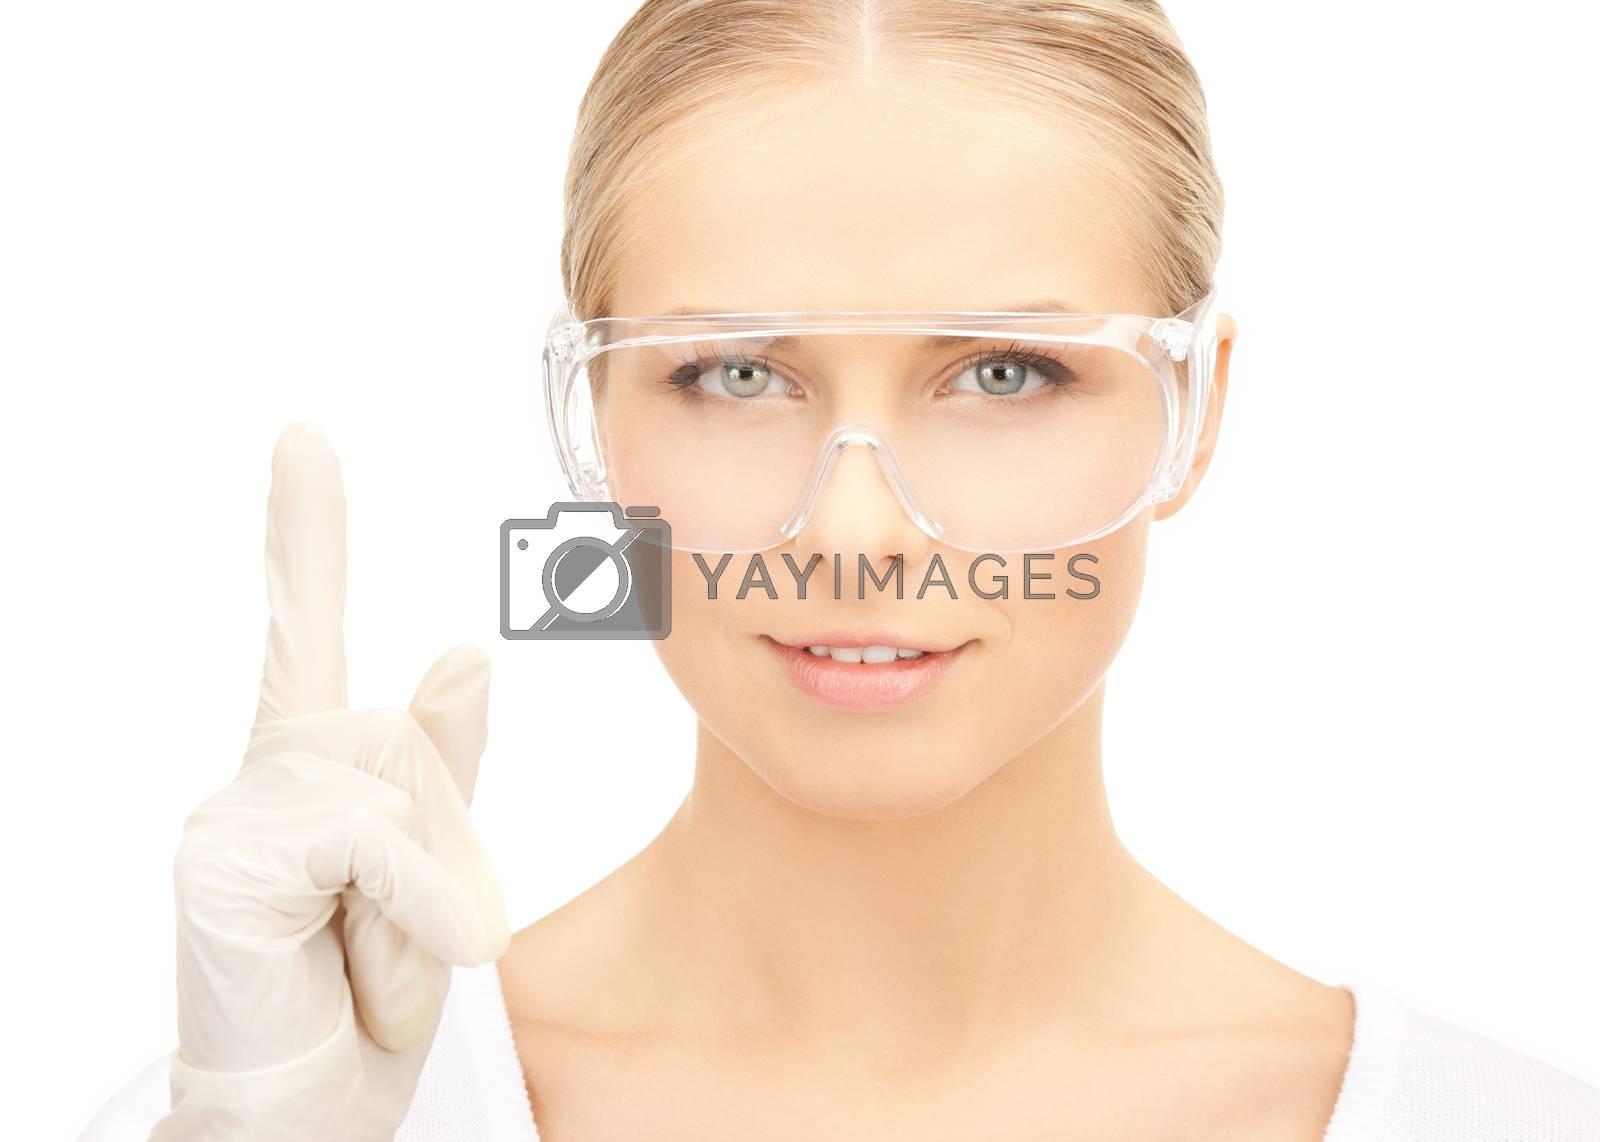 scientist in eyeglasses holding finger up by dolgachov